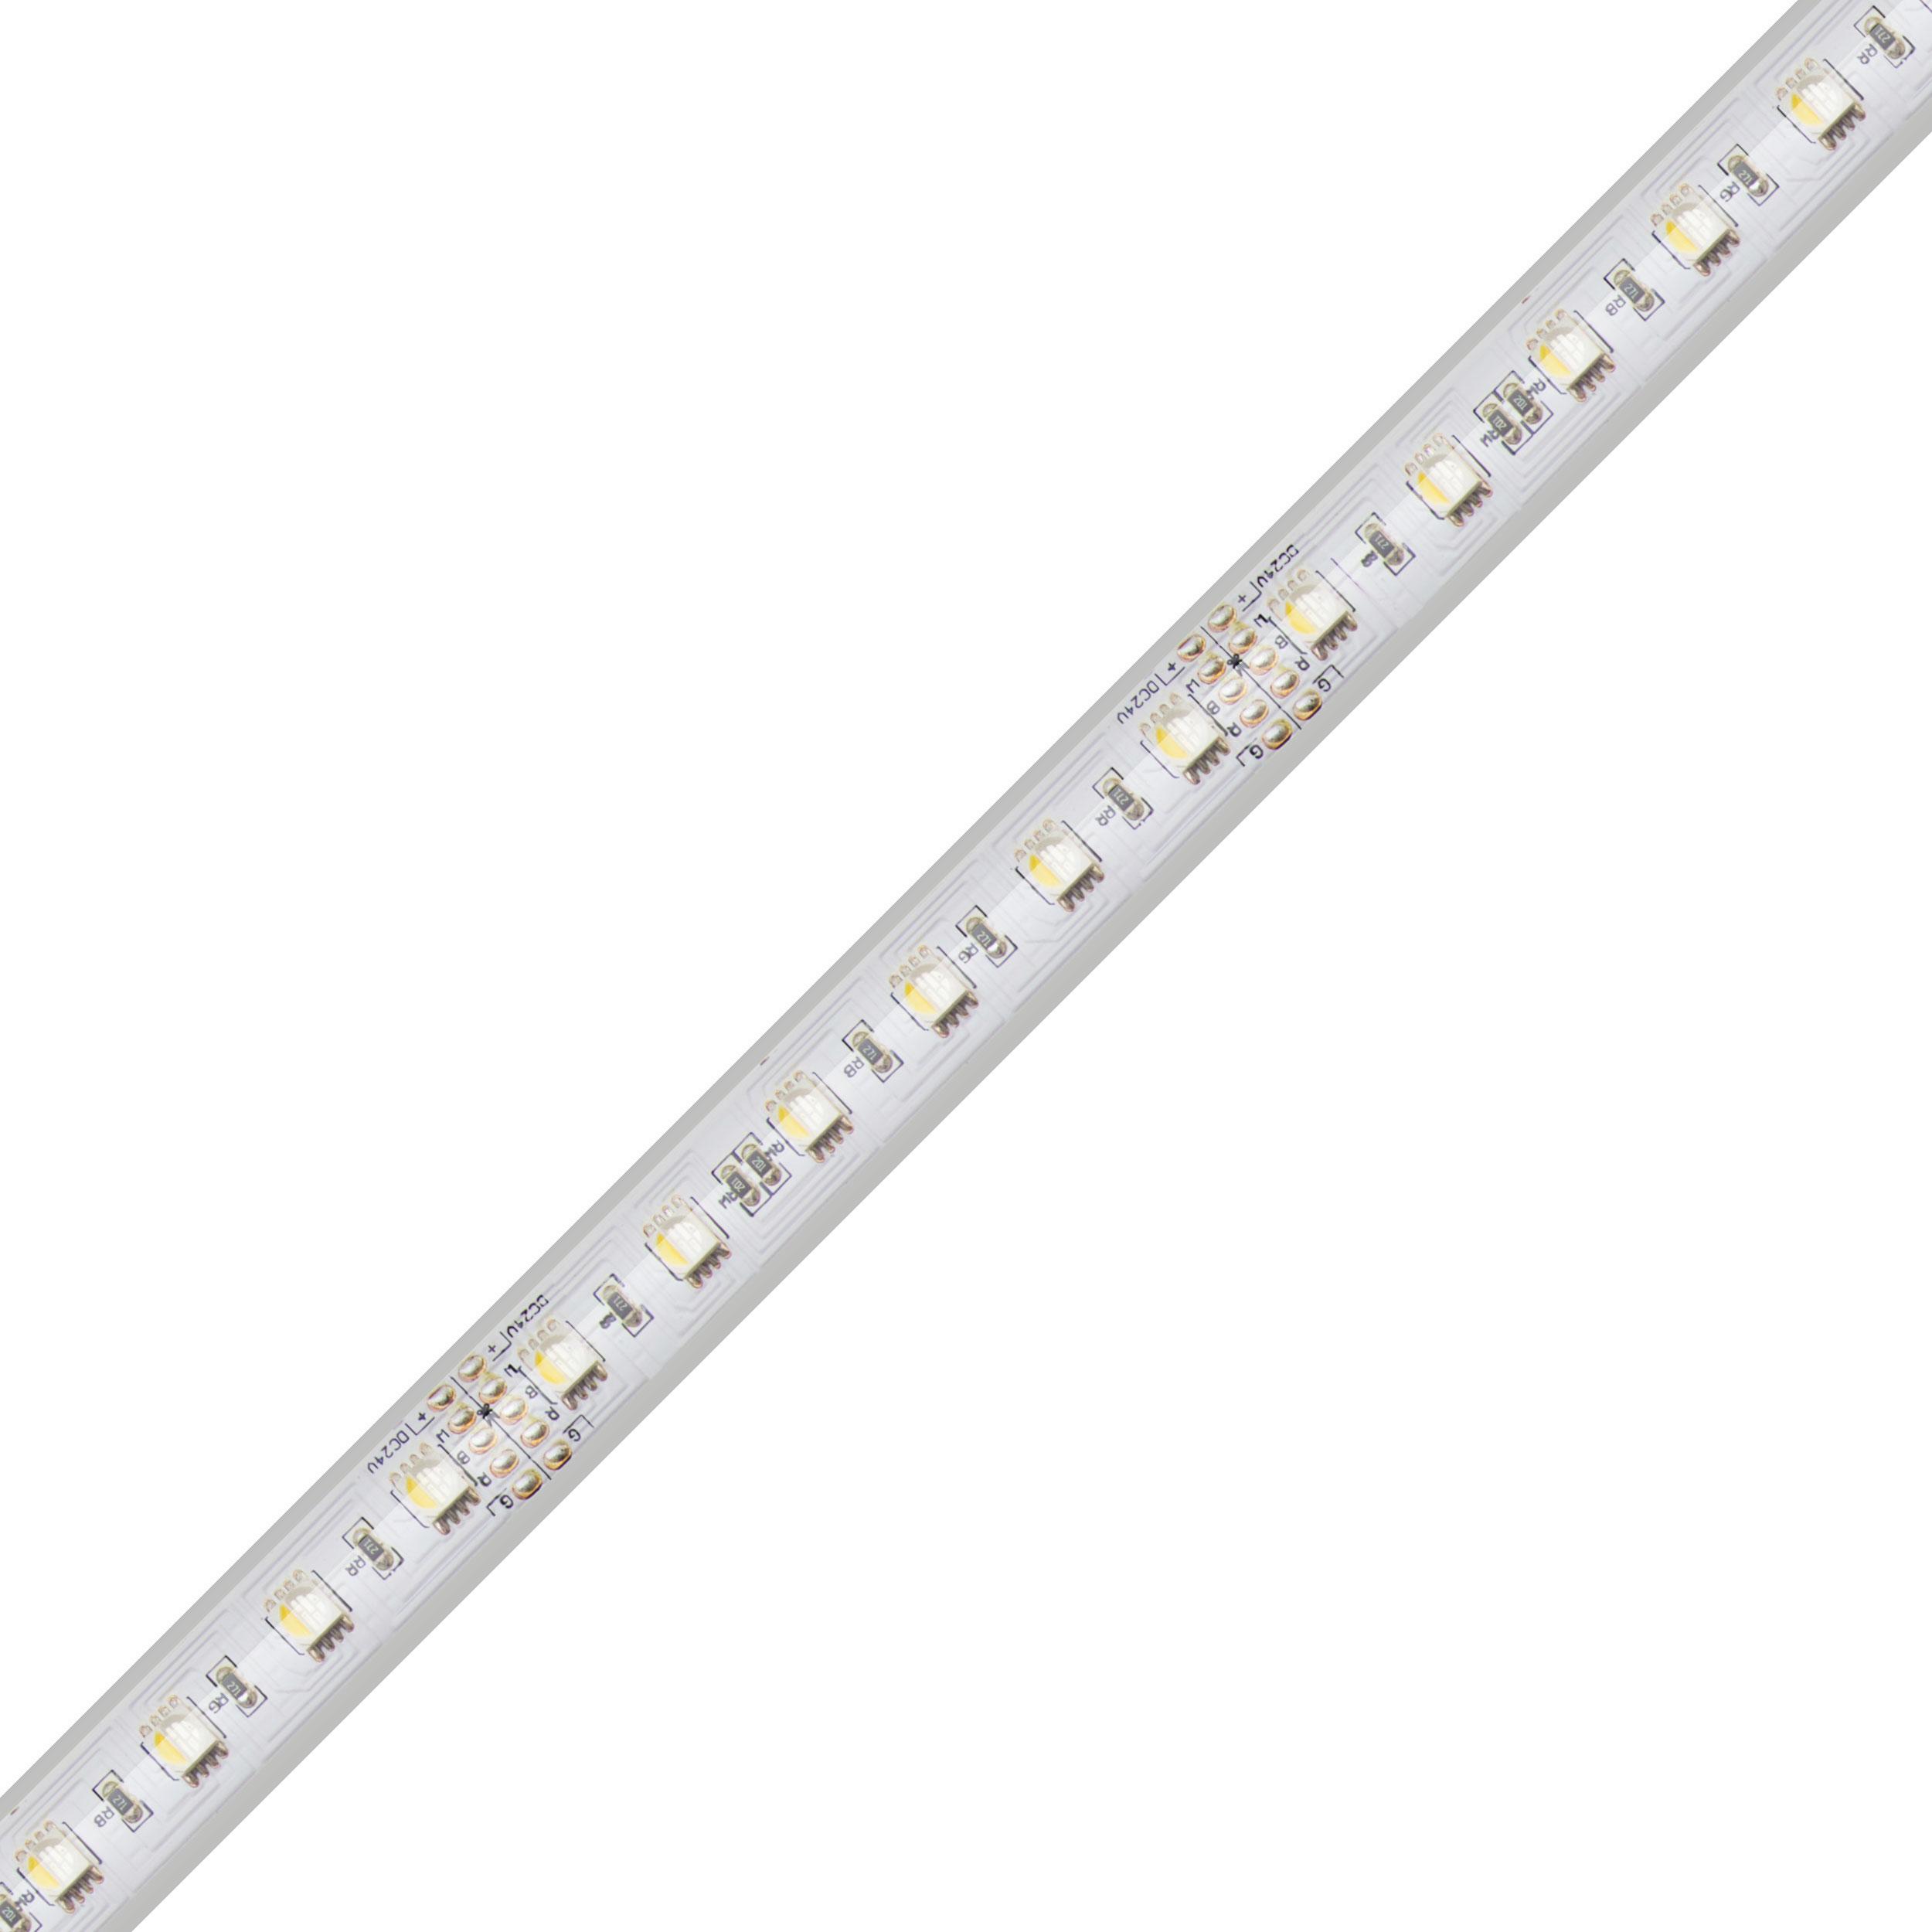 Blaze 12v Wet Location Led Strip: DAZZLE 24® 24V RGBW 4D LED Tape Light